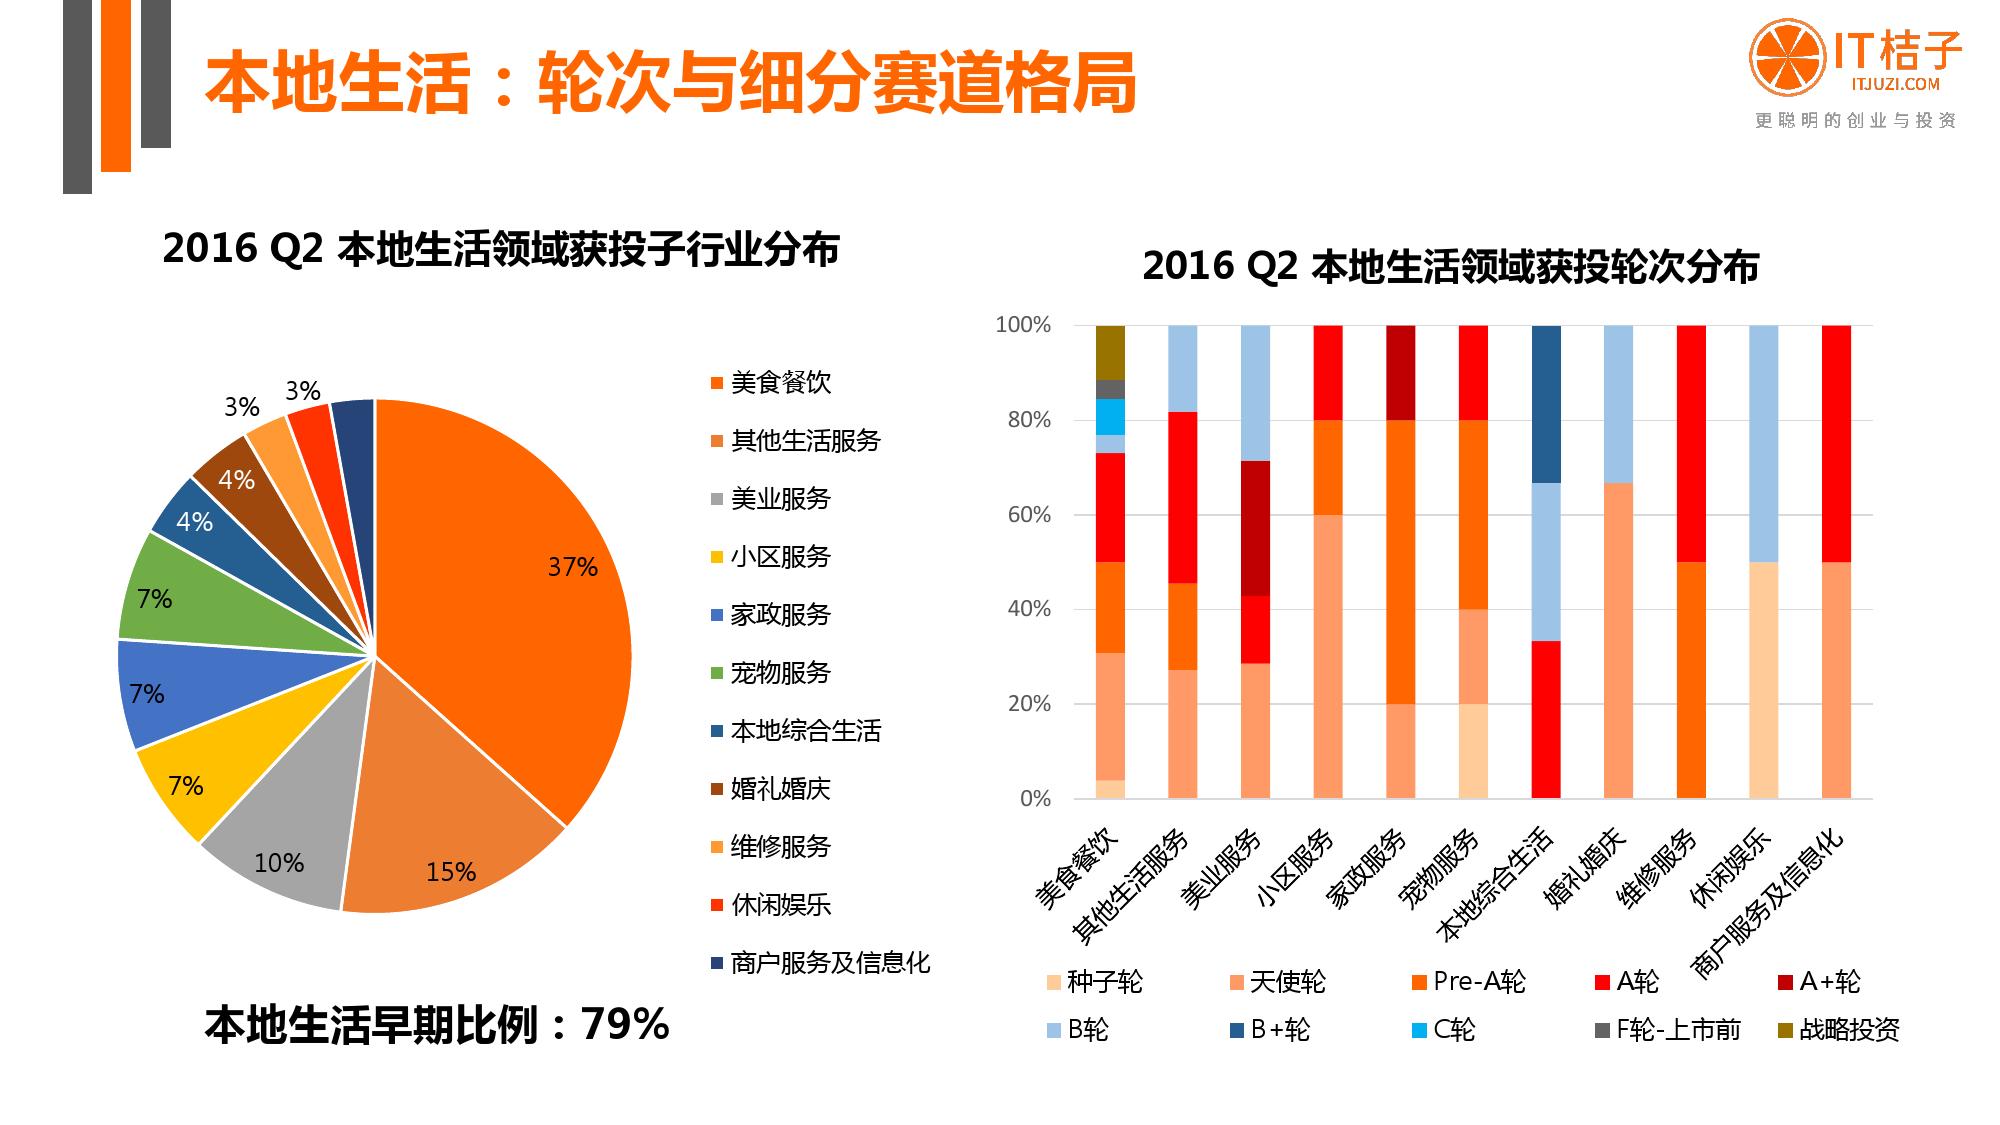 【IT桔子】2016年Q2中国互联网创业投资分析报告_000042